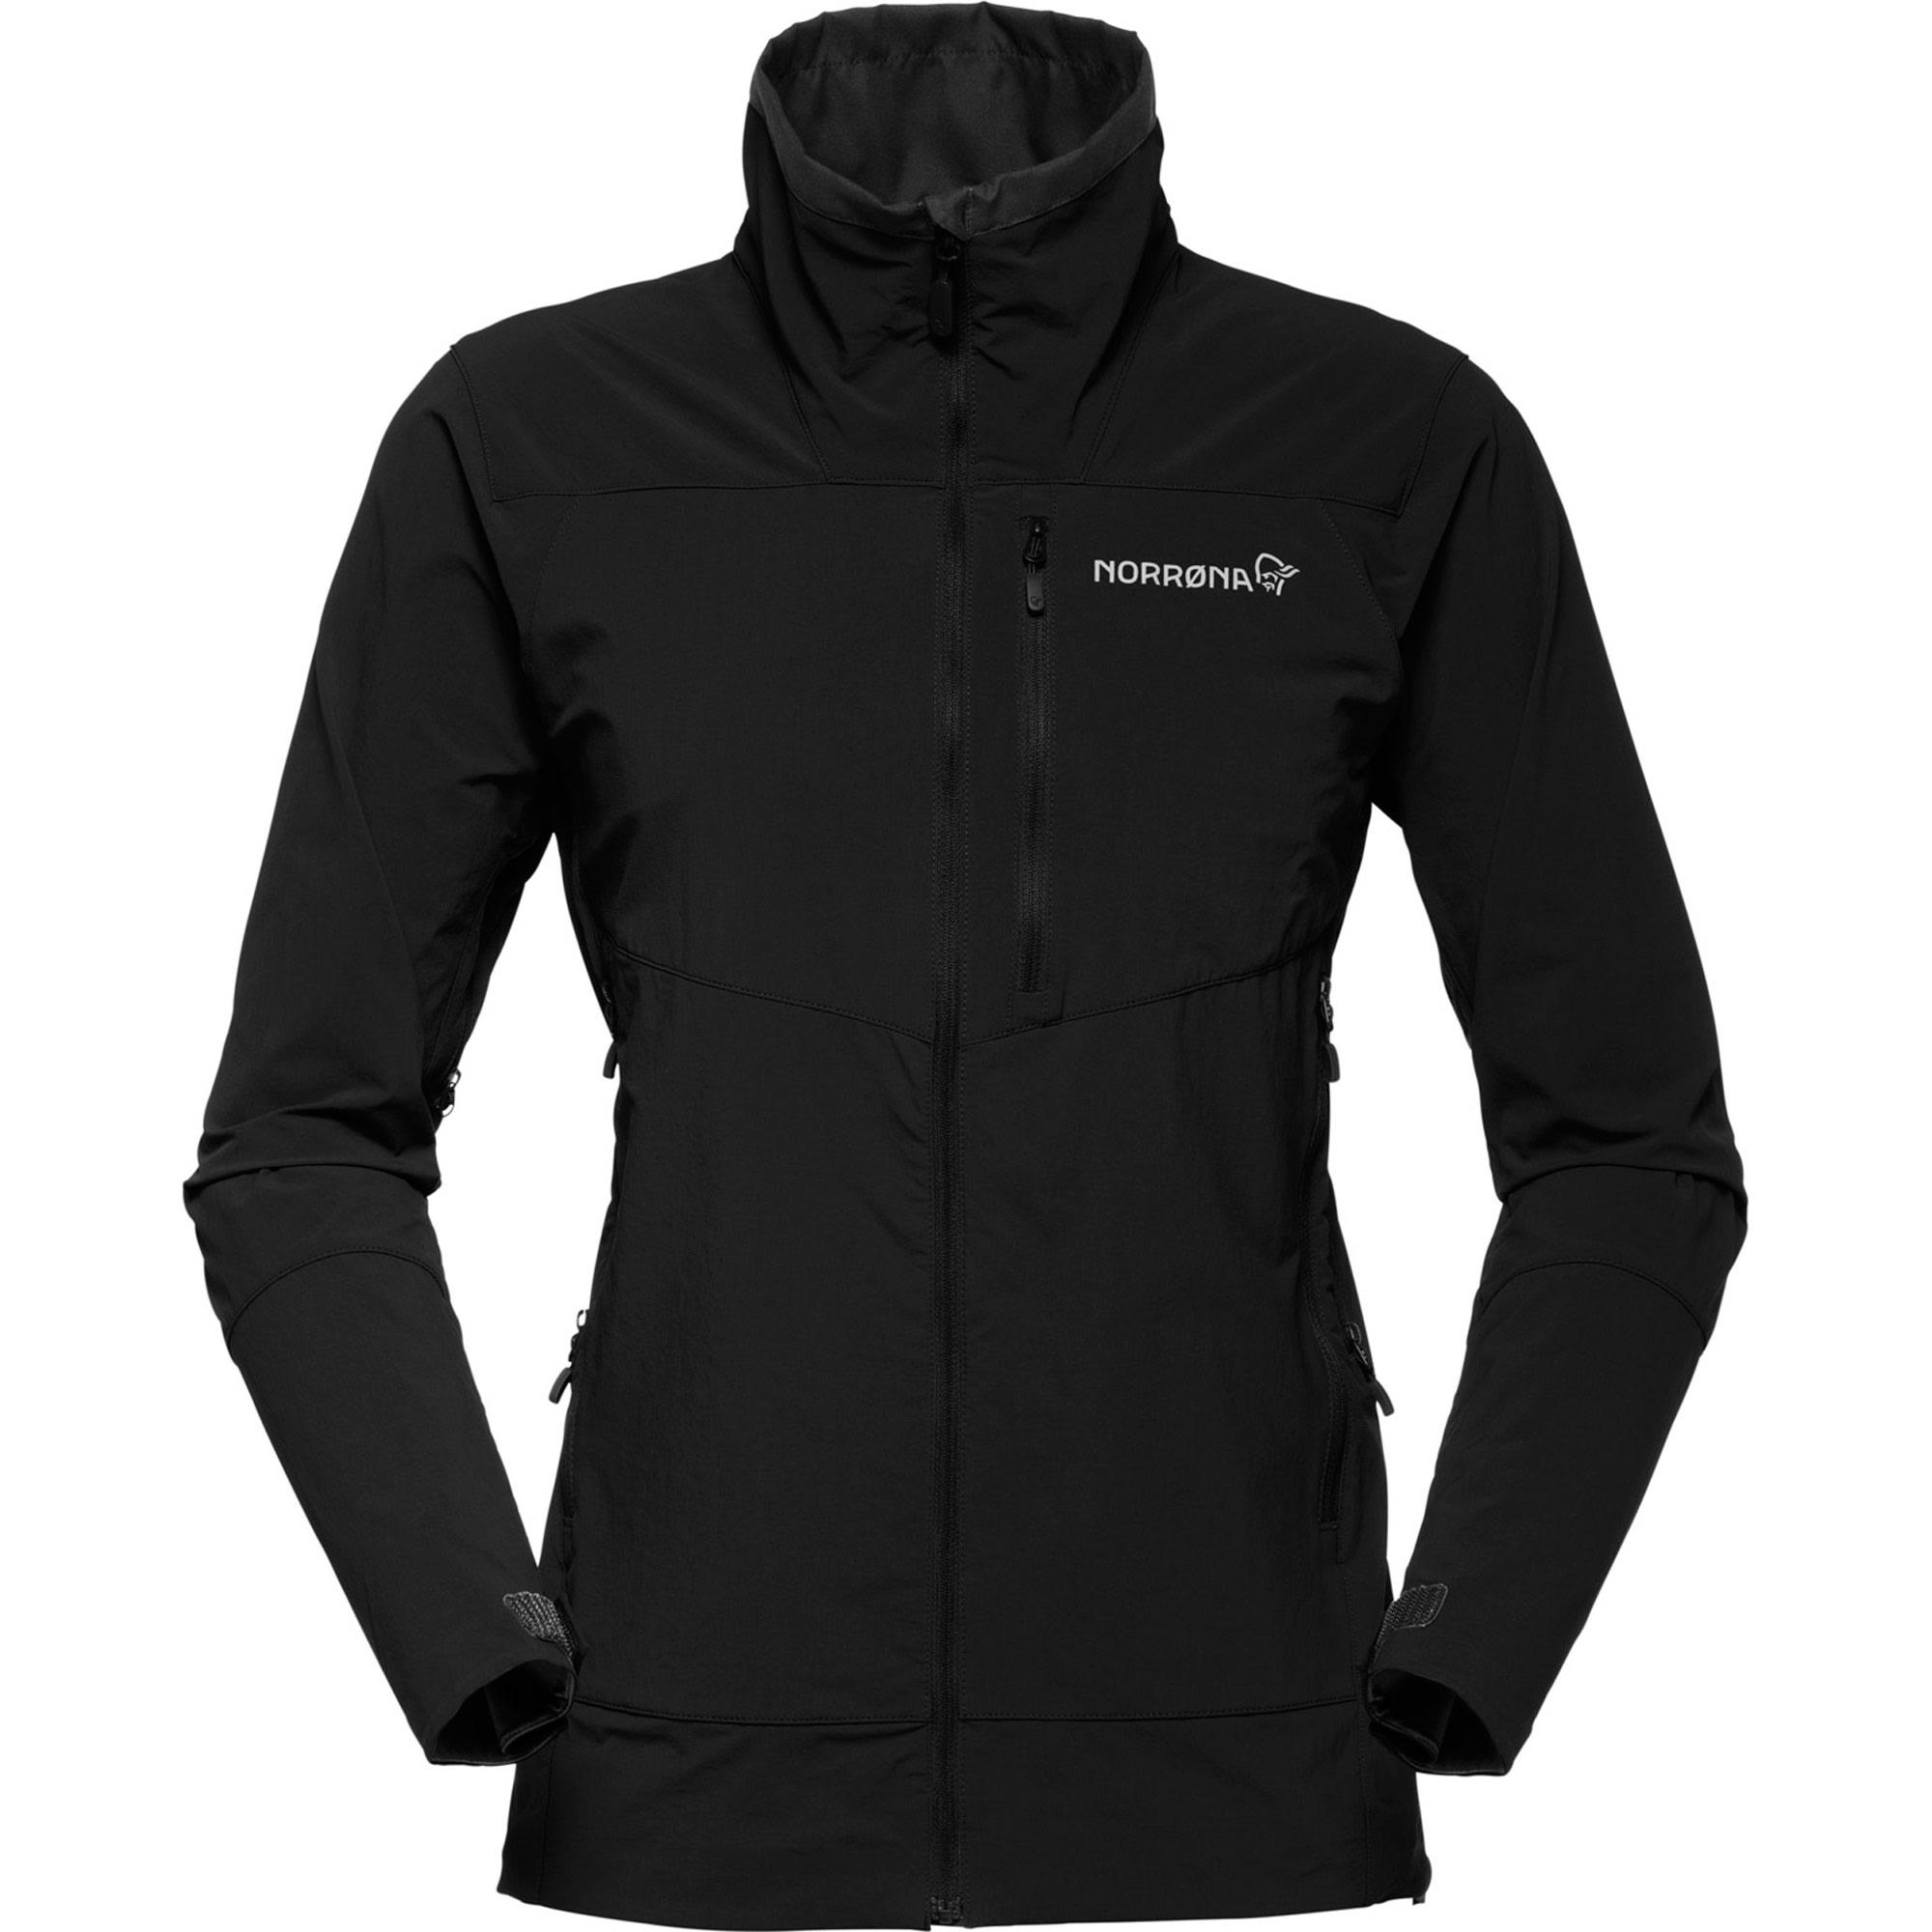 2166d6a4 Buy Norrøna Falketind Flex1 Jacket Women's (2018) from Outnorth